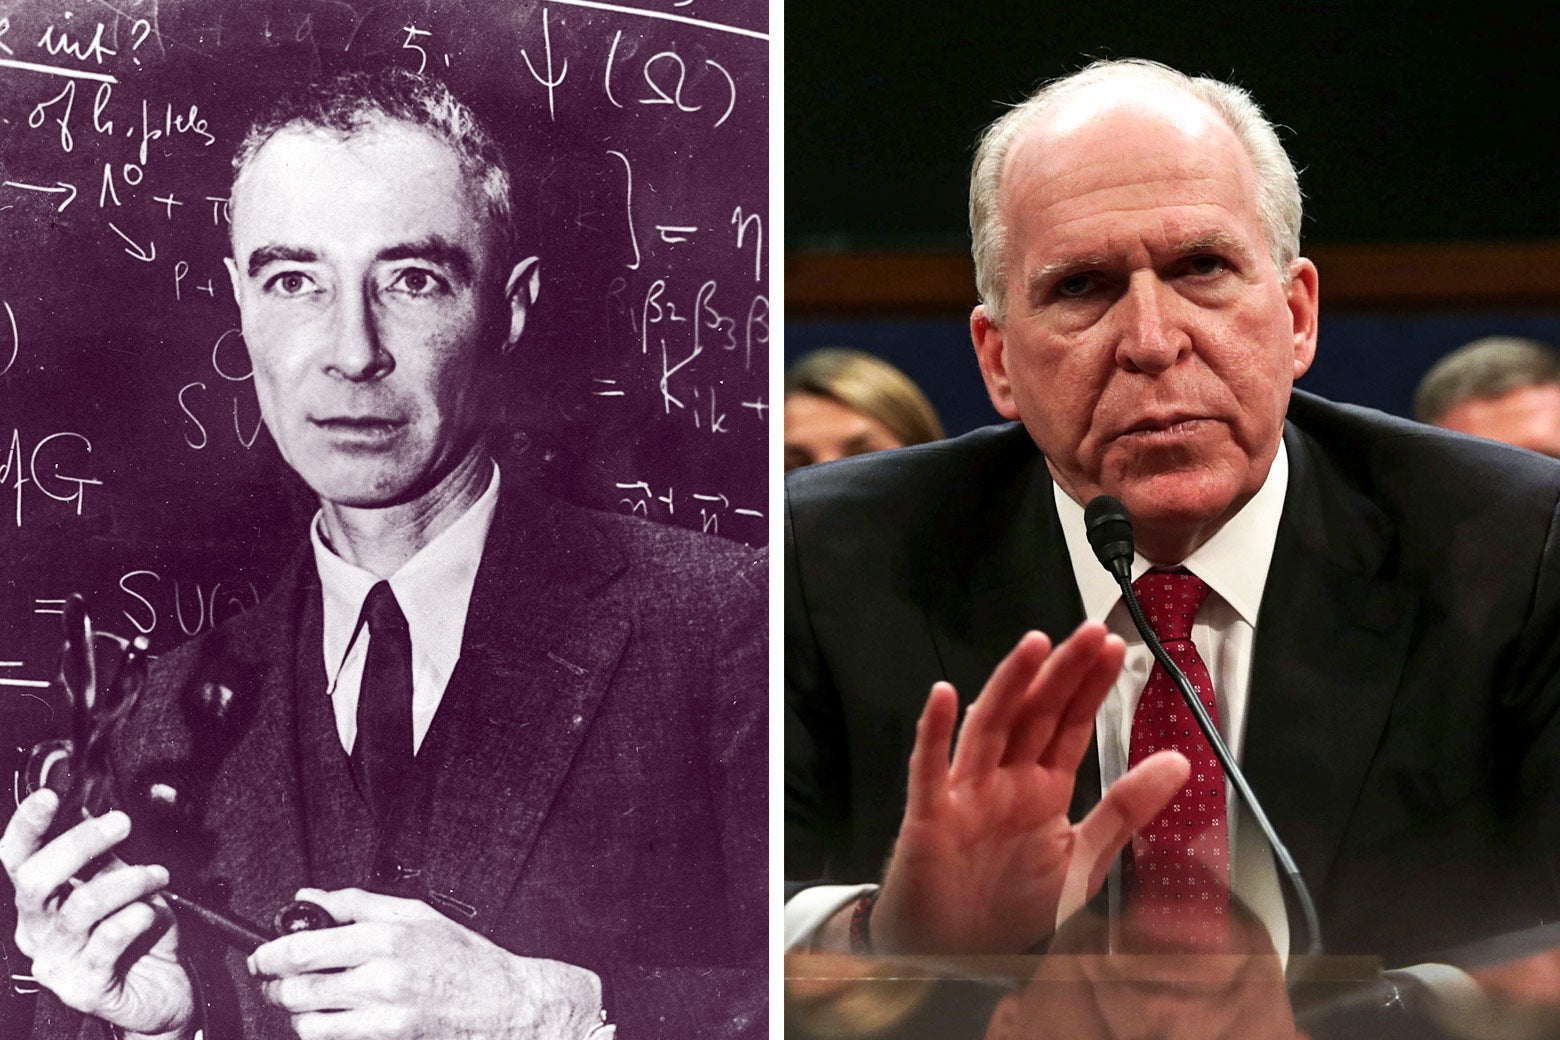 Robert Oppenheimer in front of a chalkboard, and John Brennan testifying before Congress.